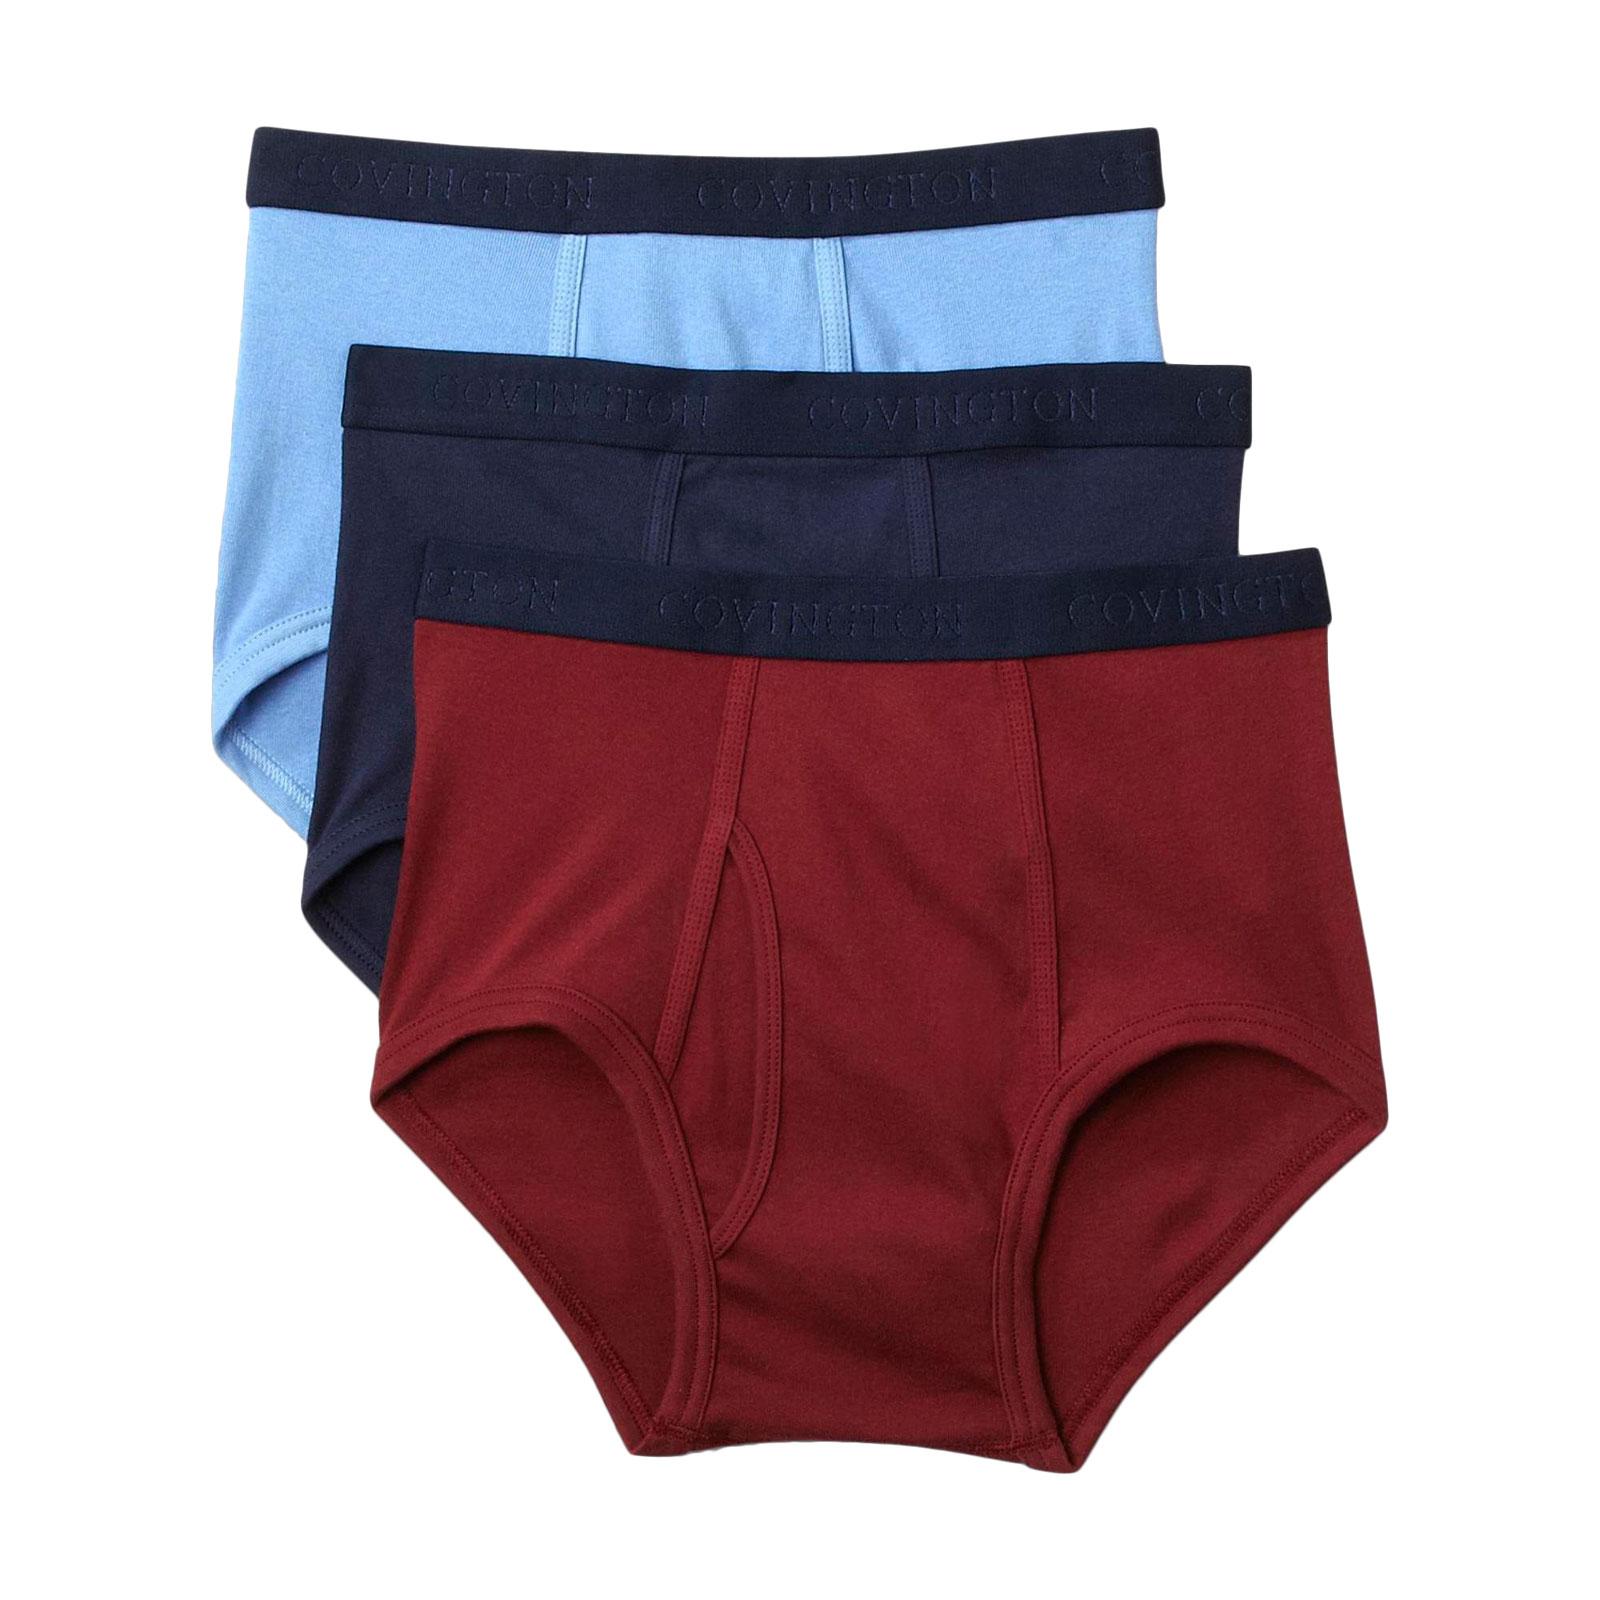 Covington Men' Briefs - 3 Pack Clothing Underwear & Undershirts